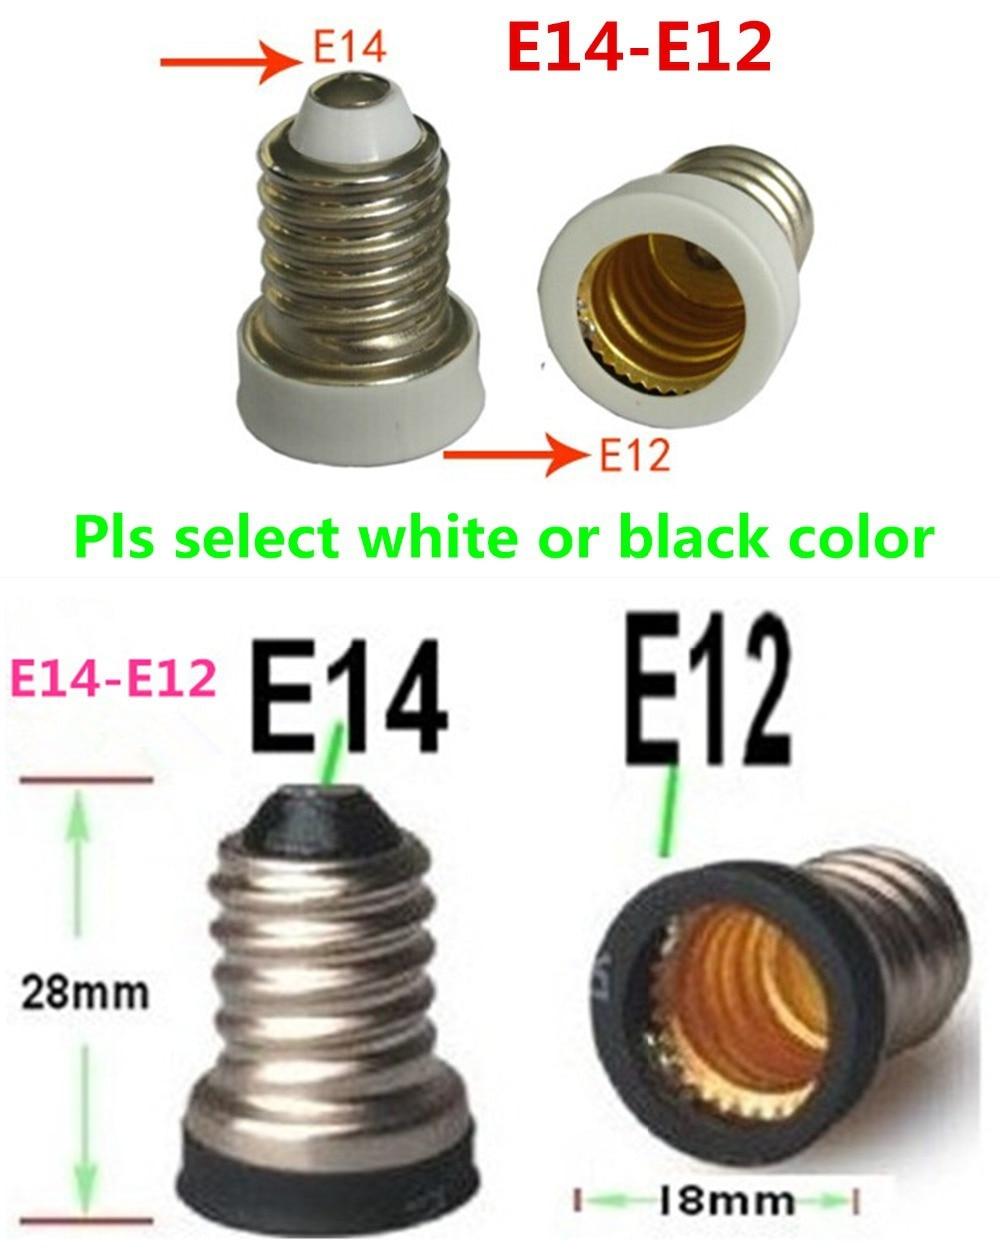 10pcs E14 To E12 Base Adapter Converter Lamp Holder E14-e12 Lamp Base Socket Adapter Free Shipping Latest Technology Lights & Lighting